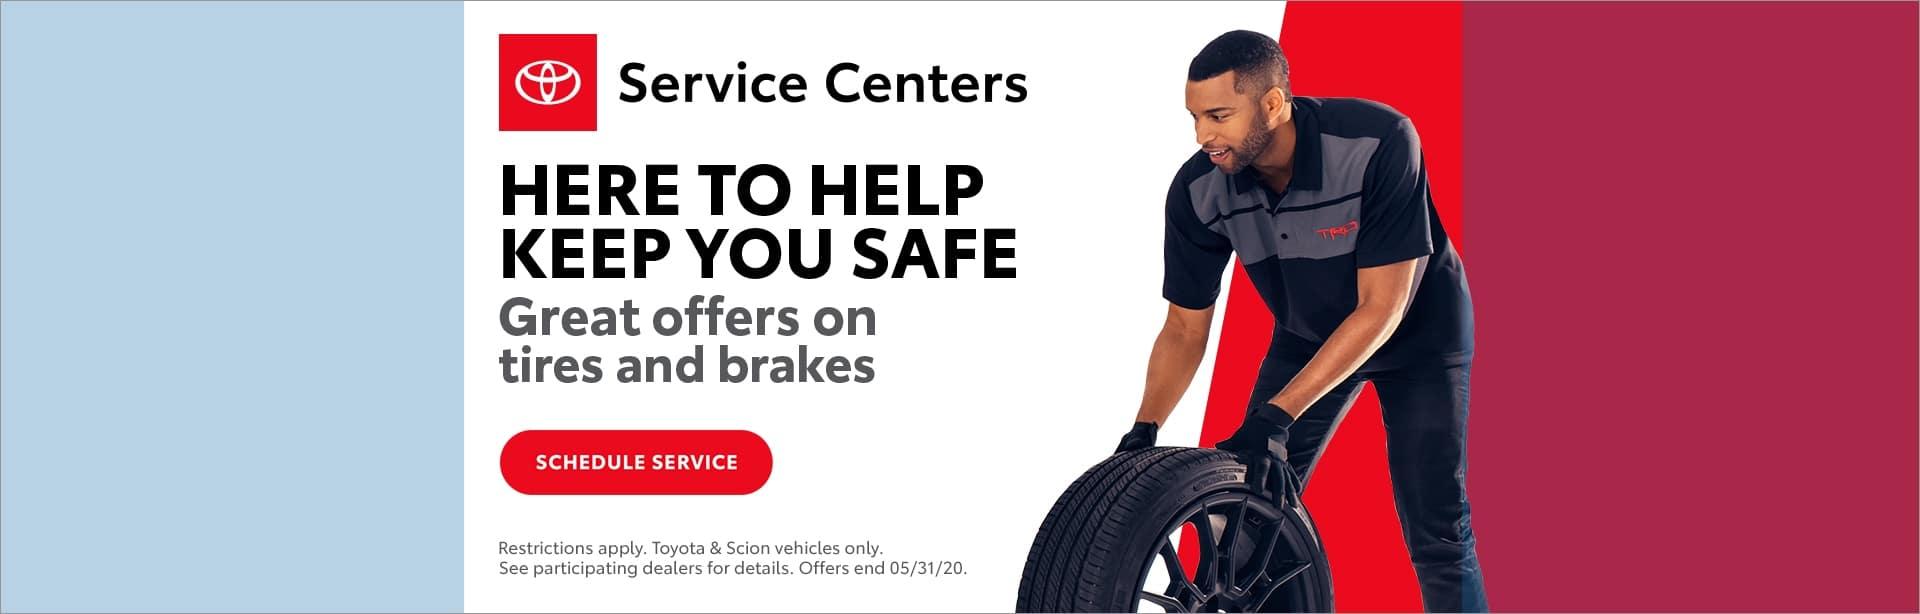 Toyota, Here to help keep you safe